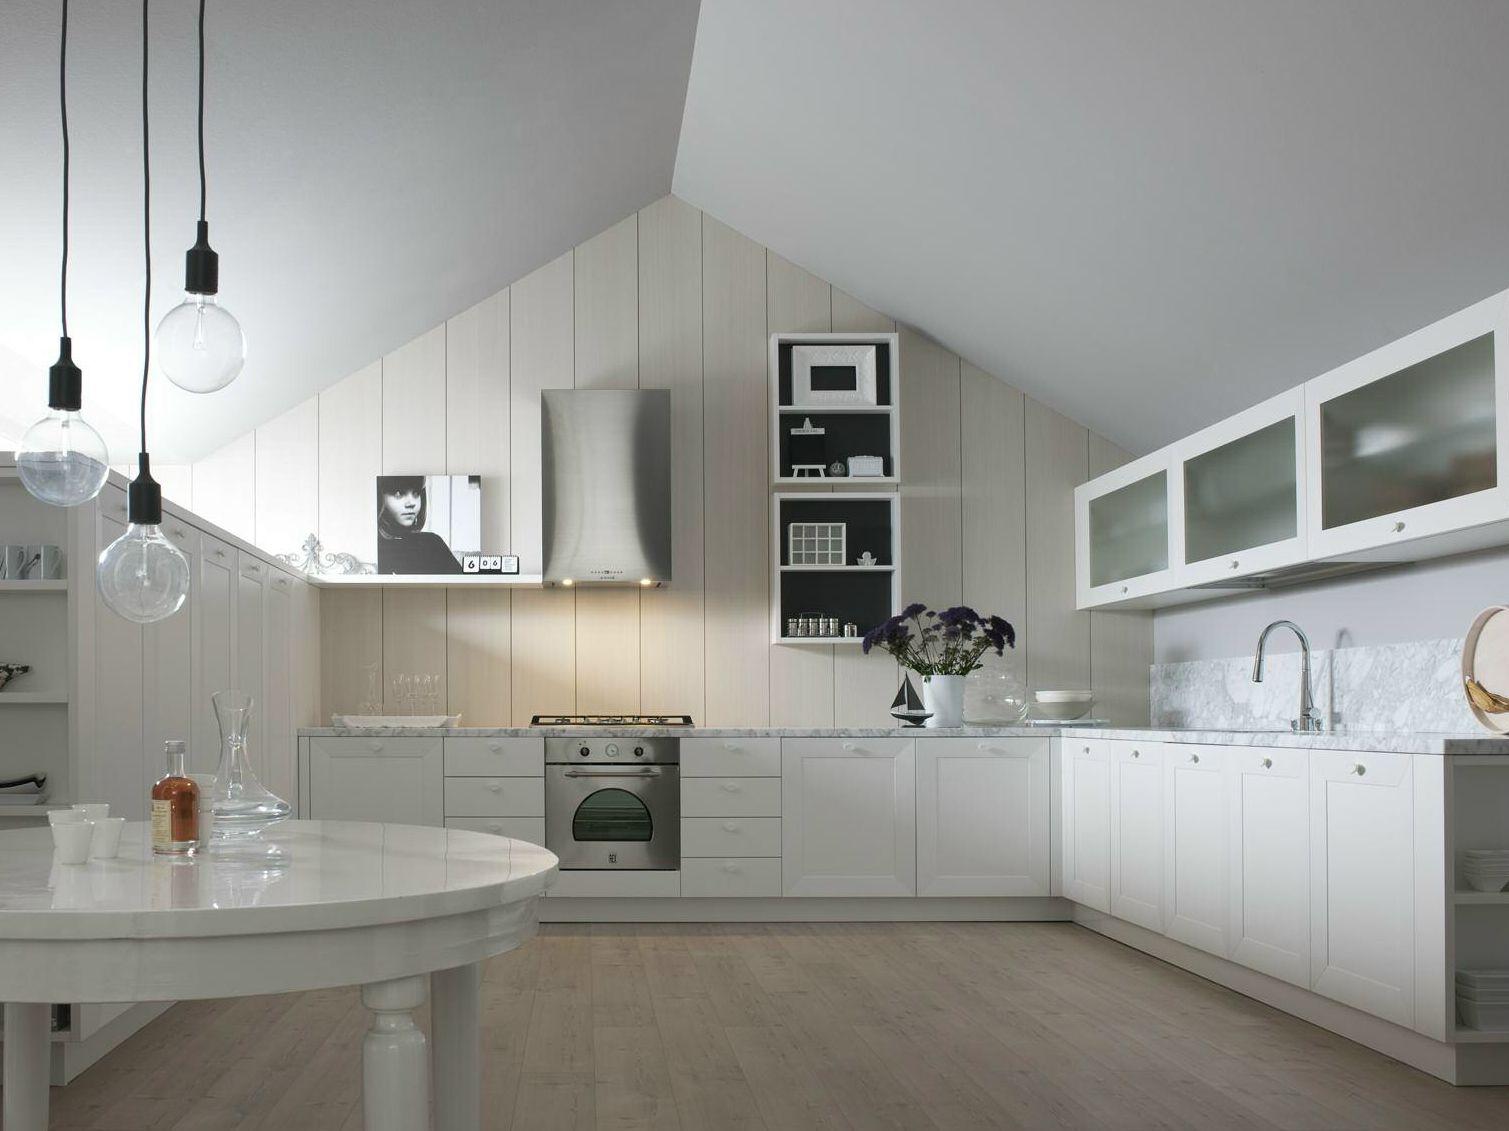 Cuisine laqu e lin aire noa composition 4 by cesar arredamenti design gian vittorio plazzogna - Cuisine lineaire 4 metres ...